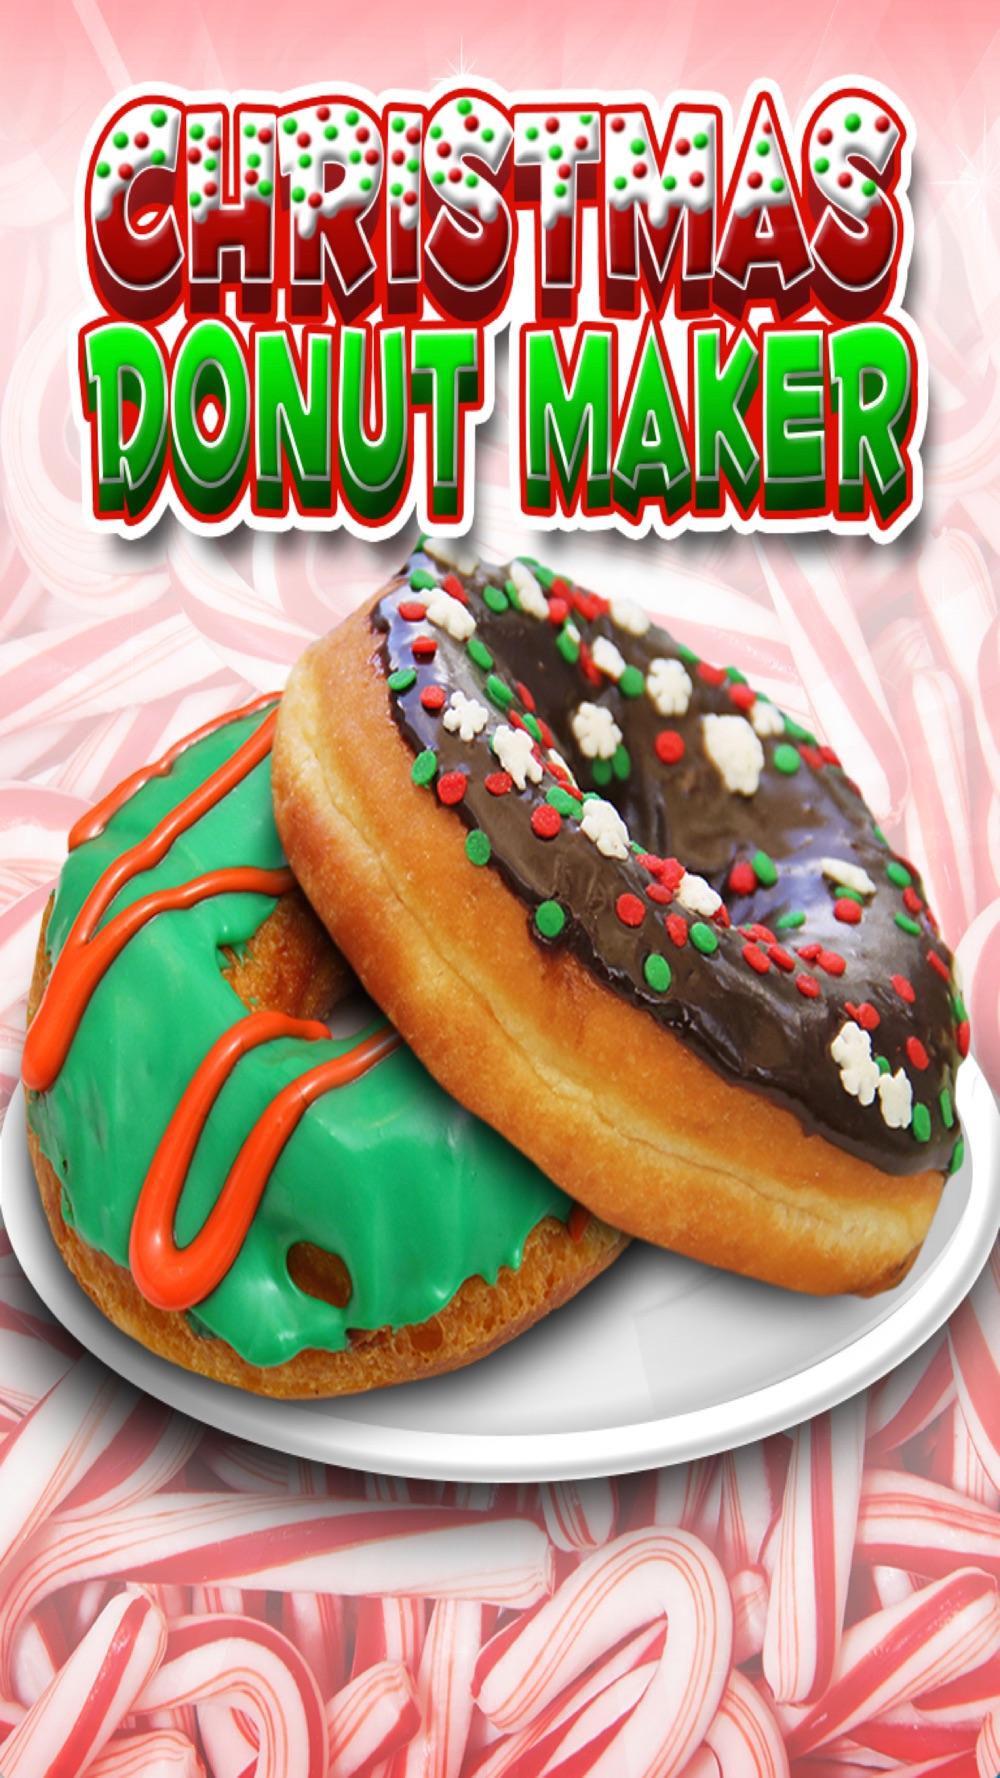 Christmas Donut Maker – Dessert Cooking Baker Game Cheat Codes